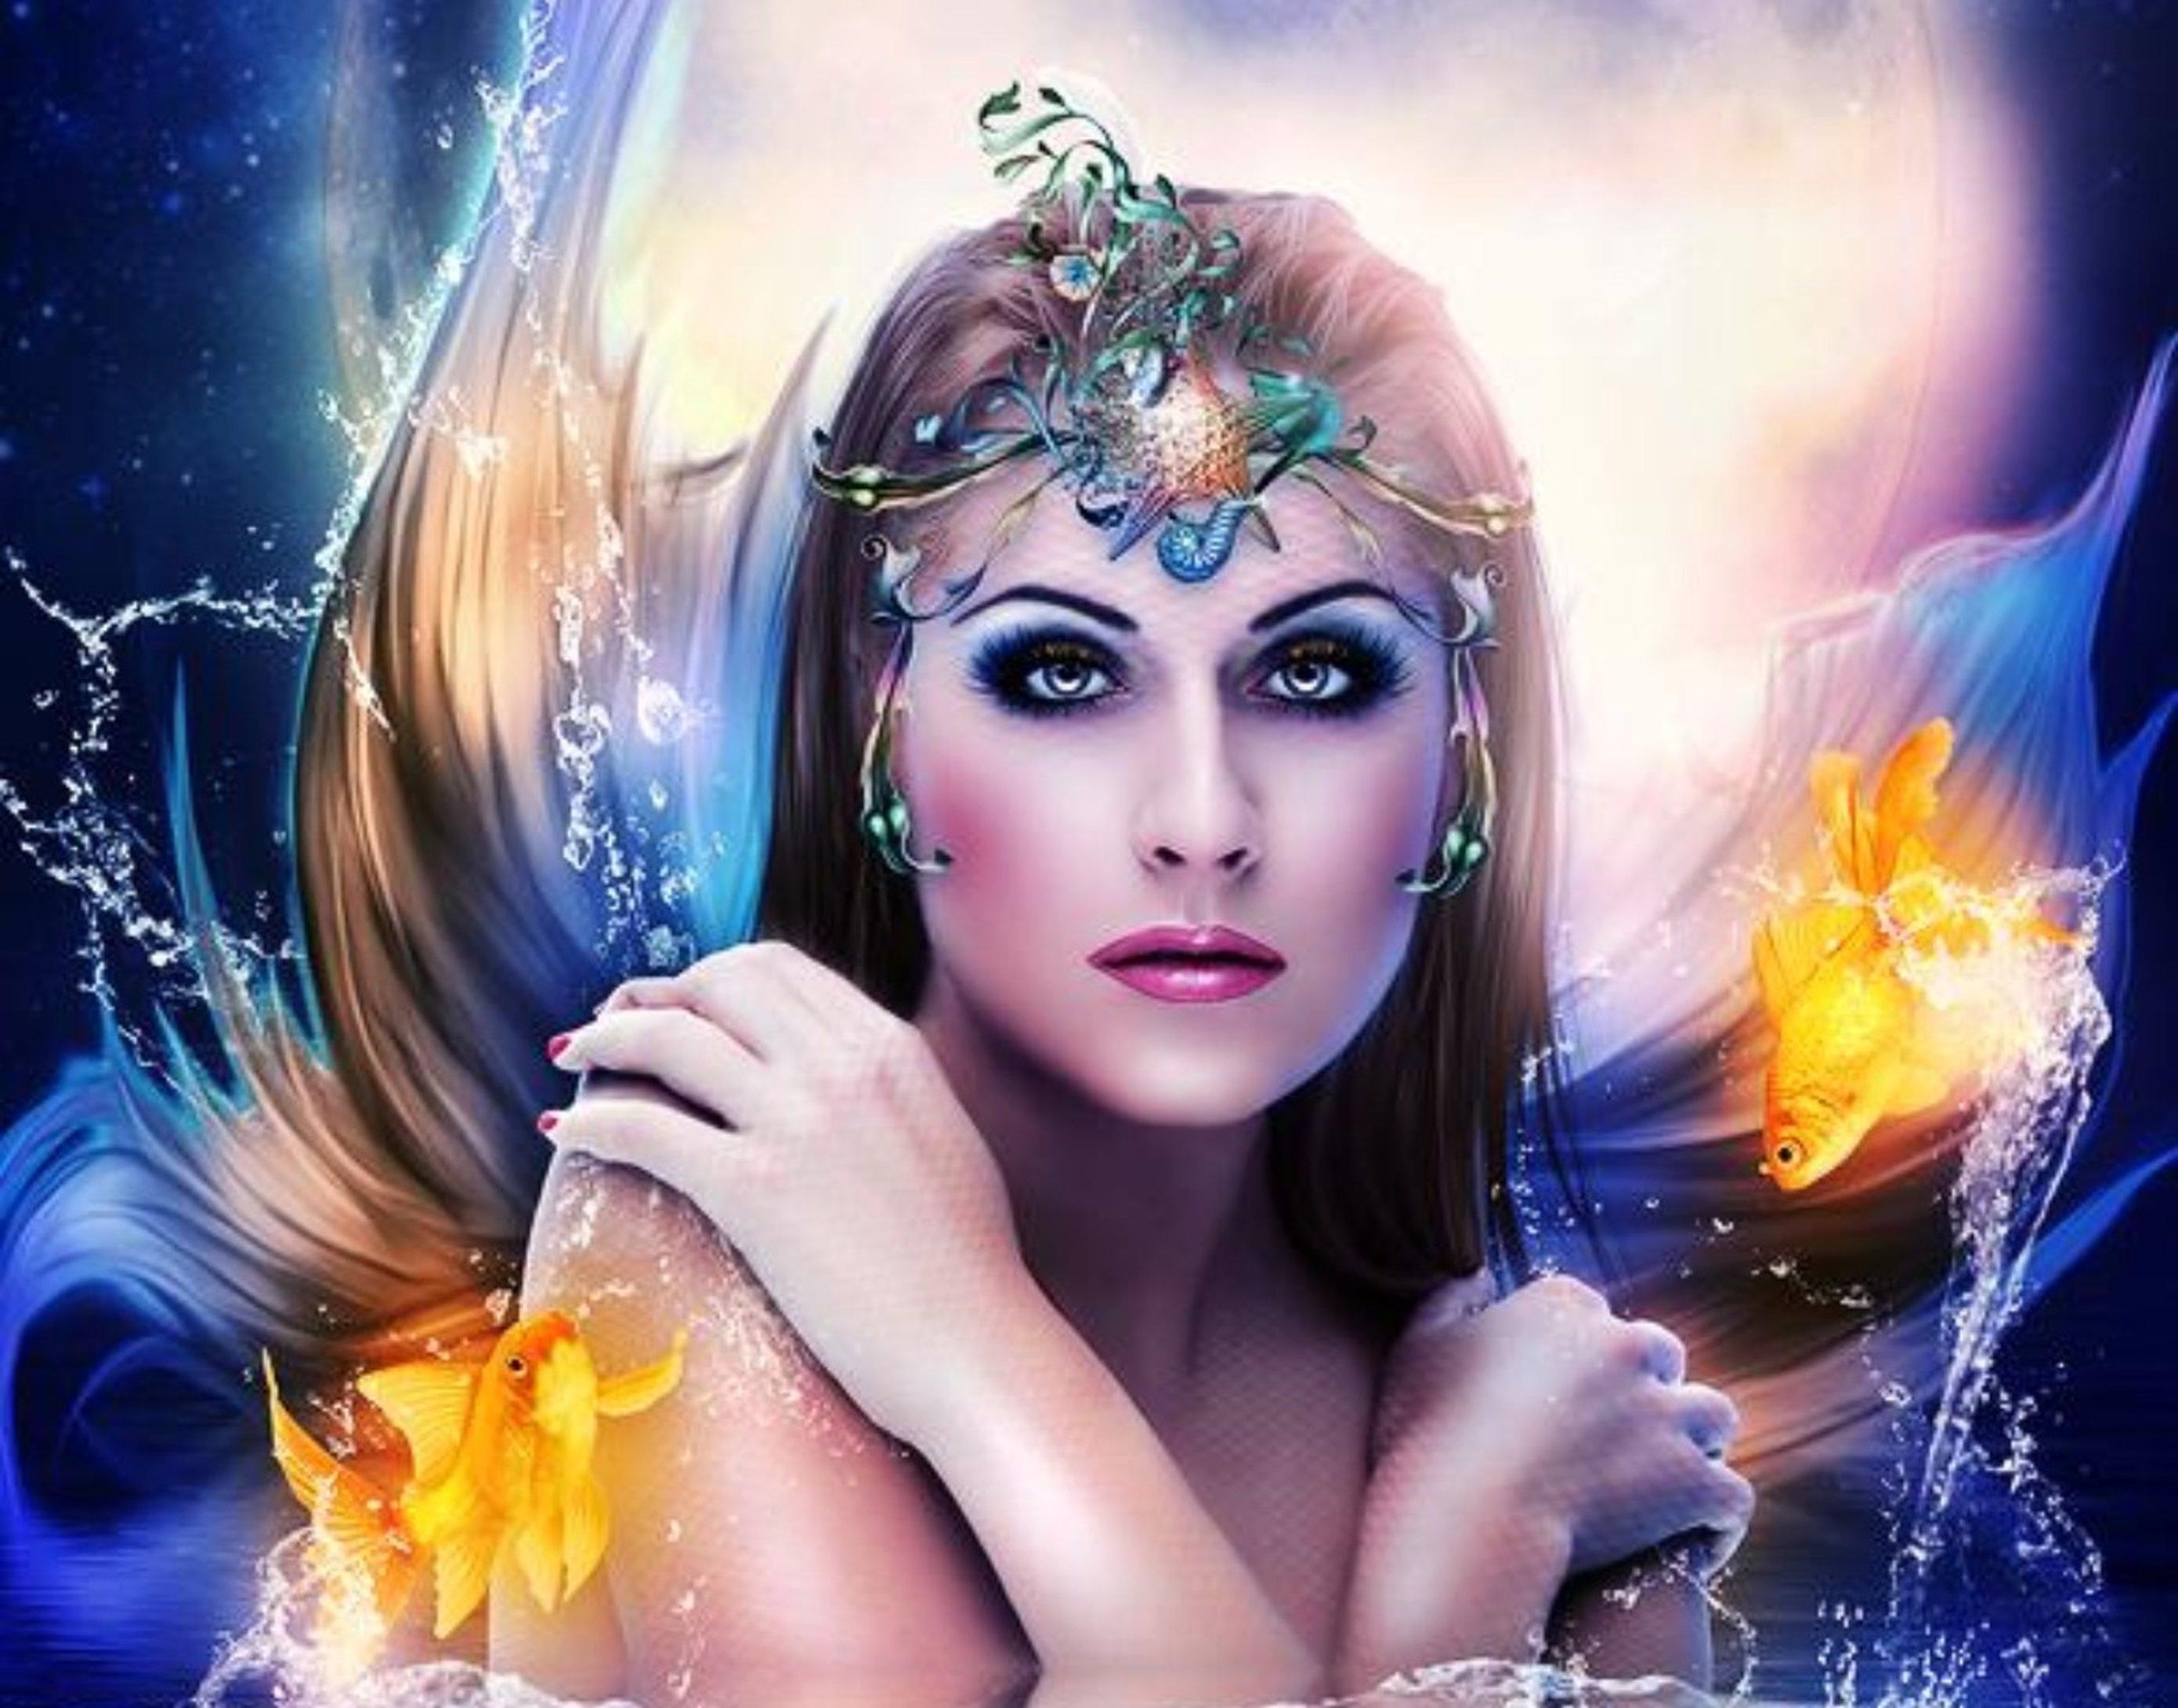 Beautiful Woman Fantasy Girl Wallpaper 2780x2180 493603